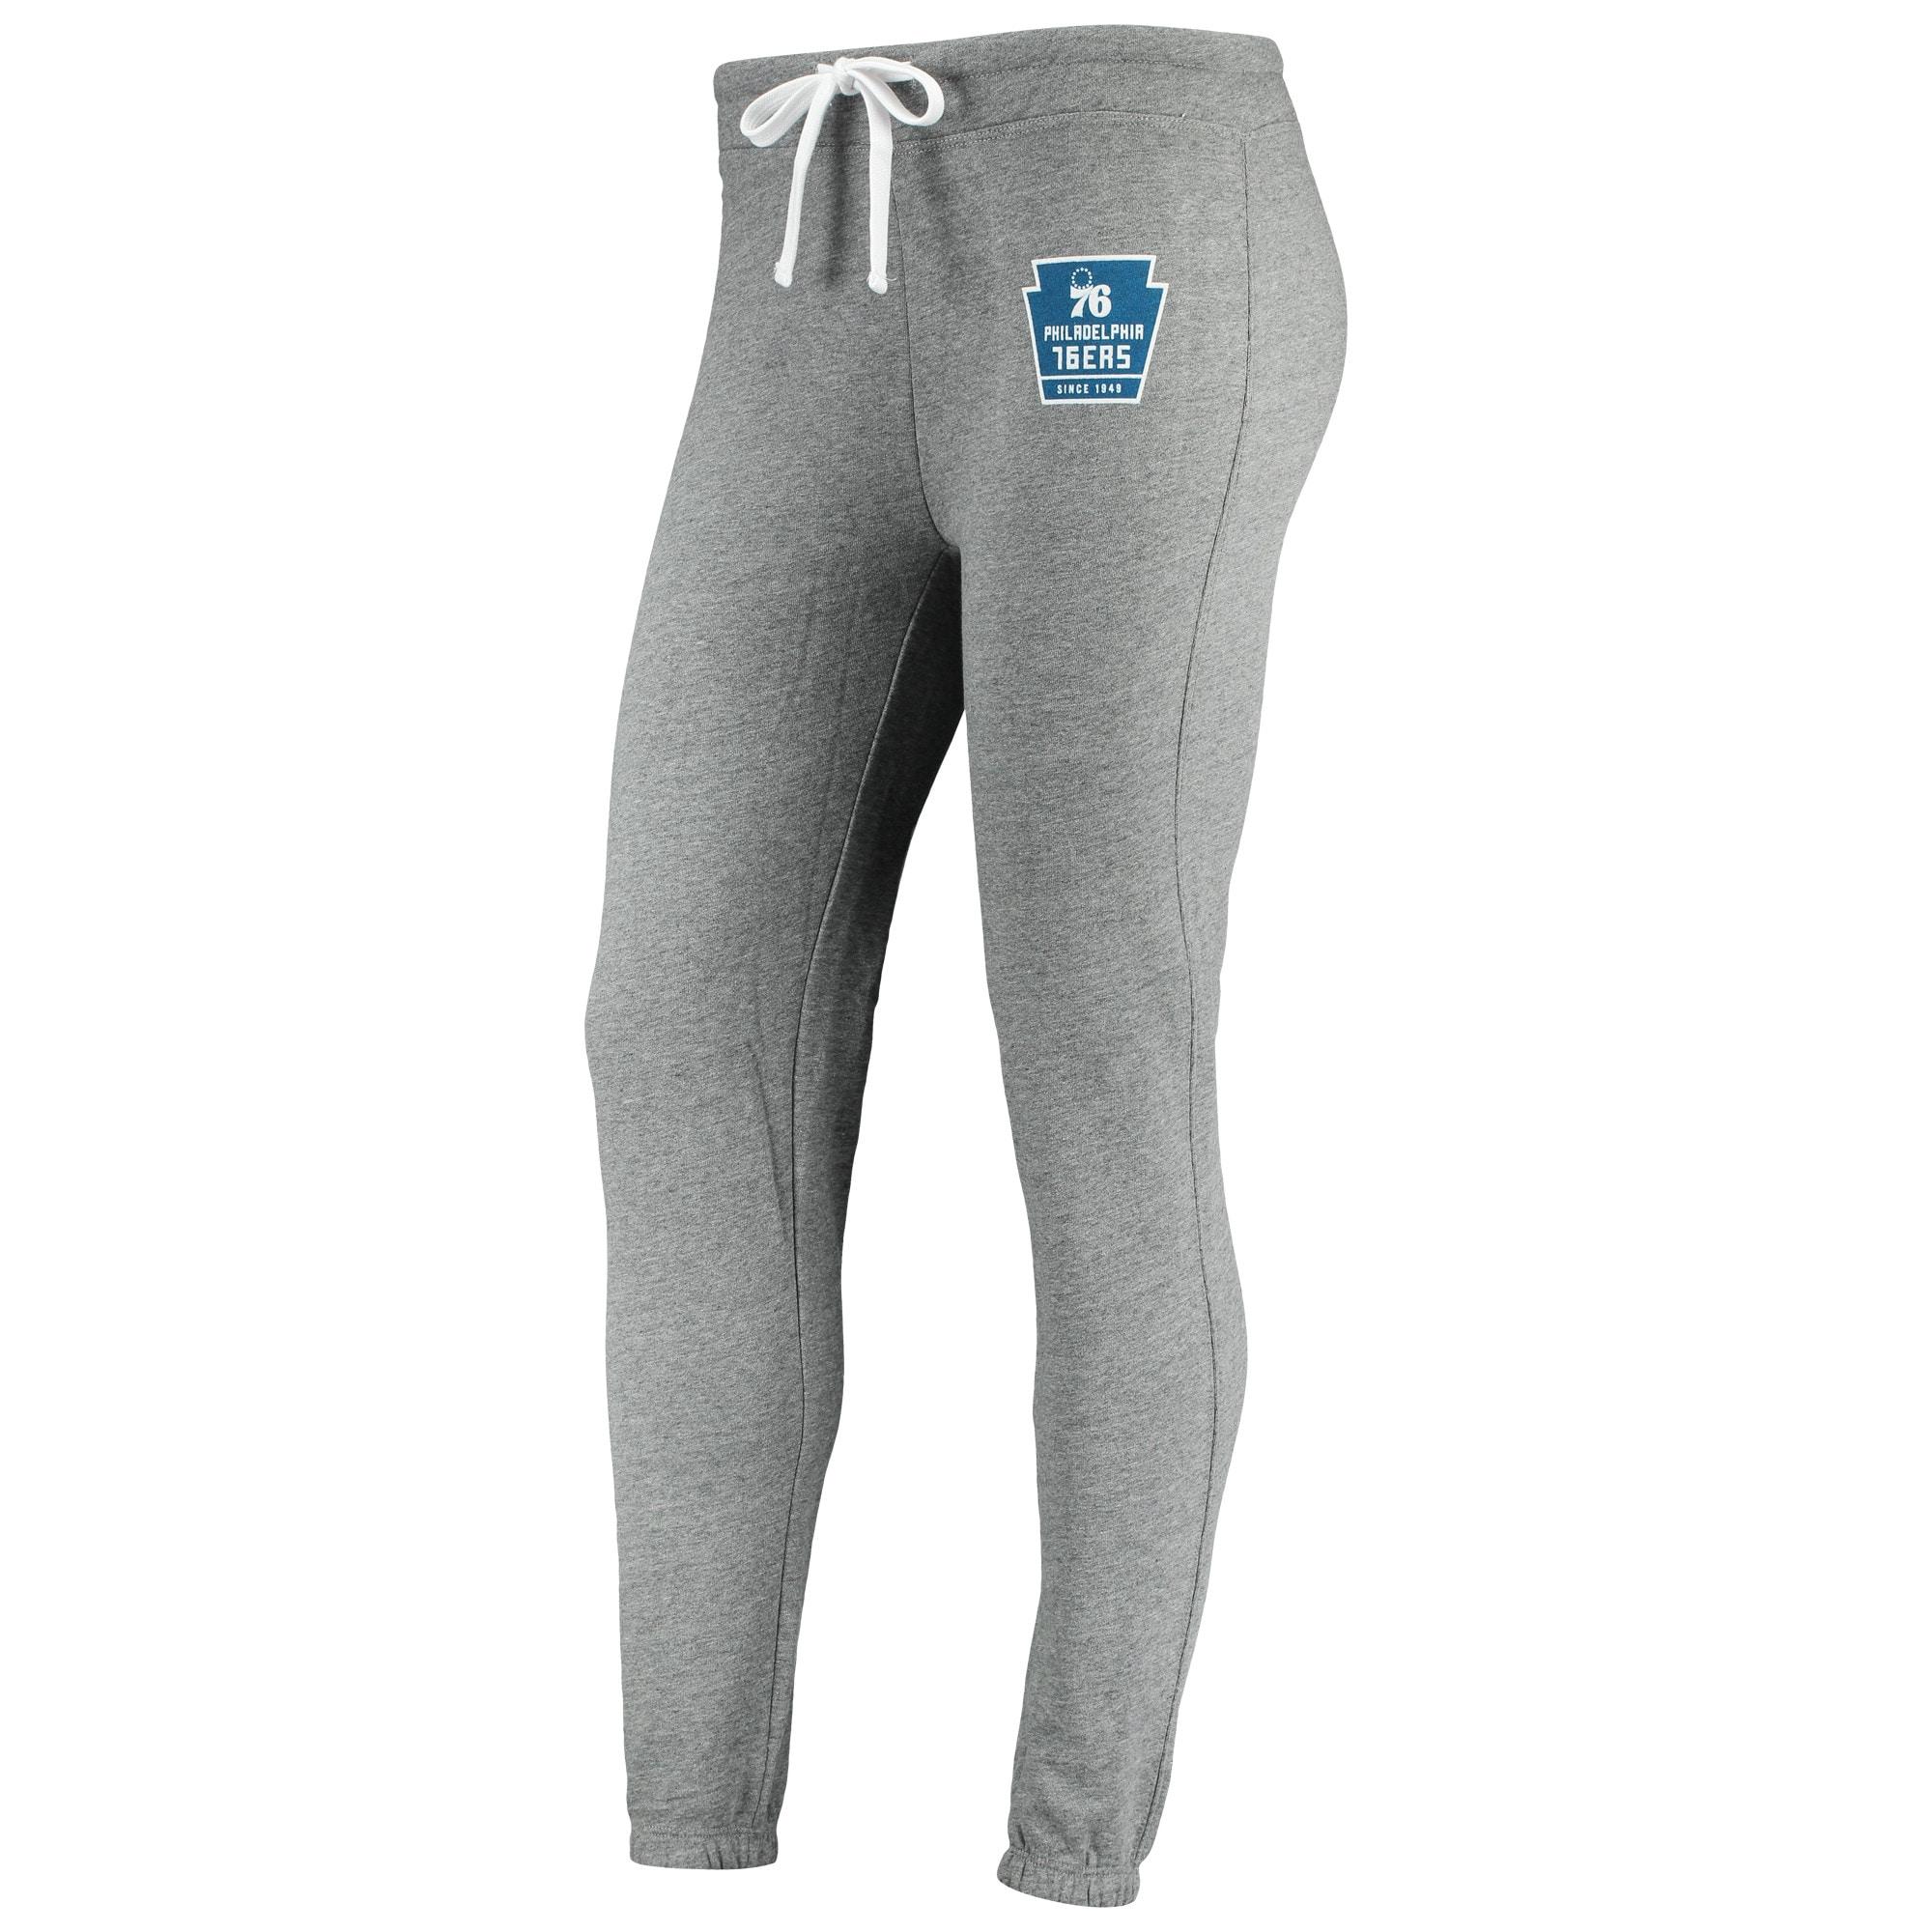 Philadelphia 76ers Sportiqe Women's Dundee Classic Sweatpants - Gray